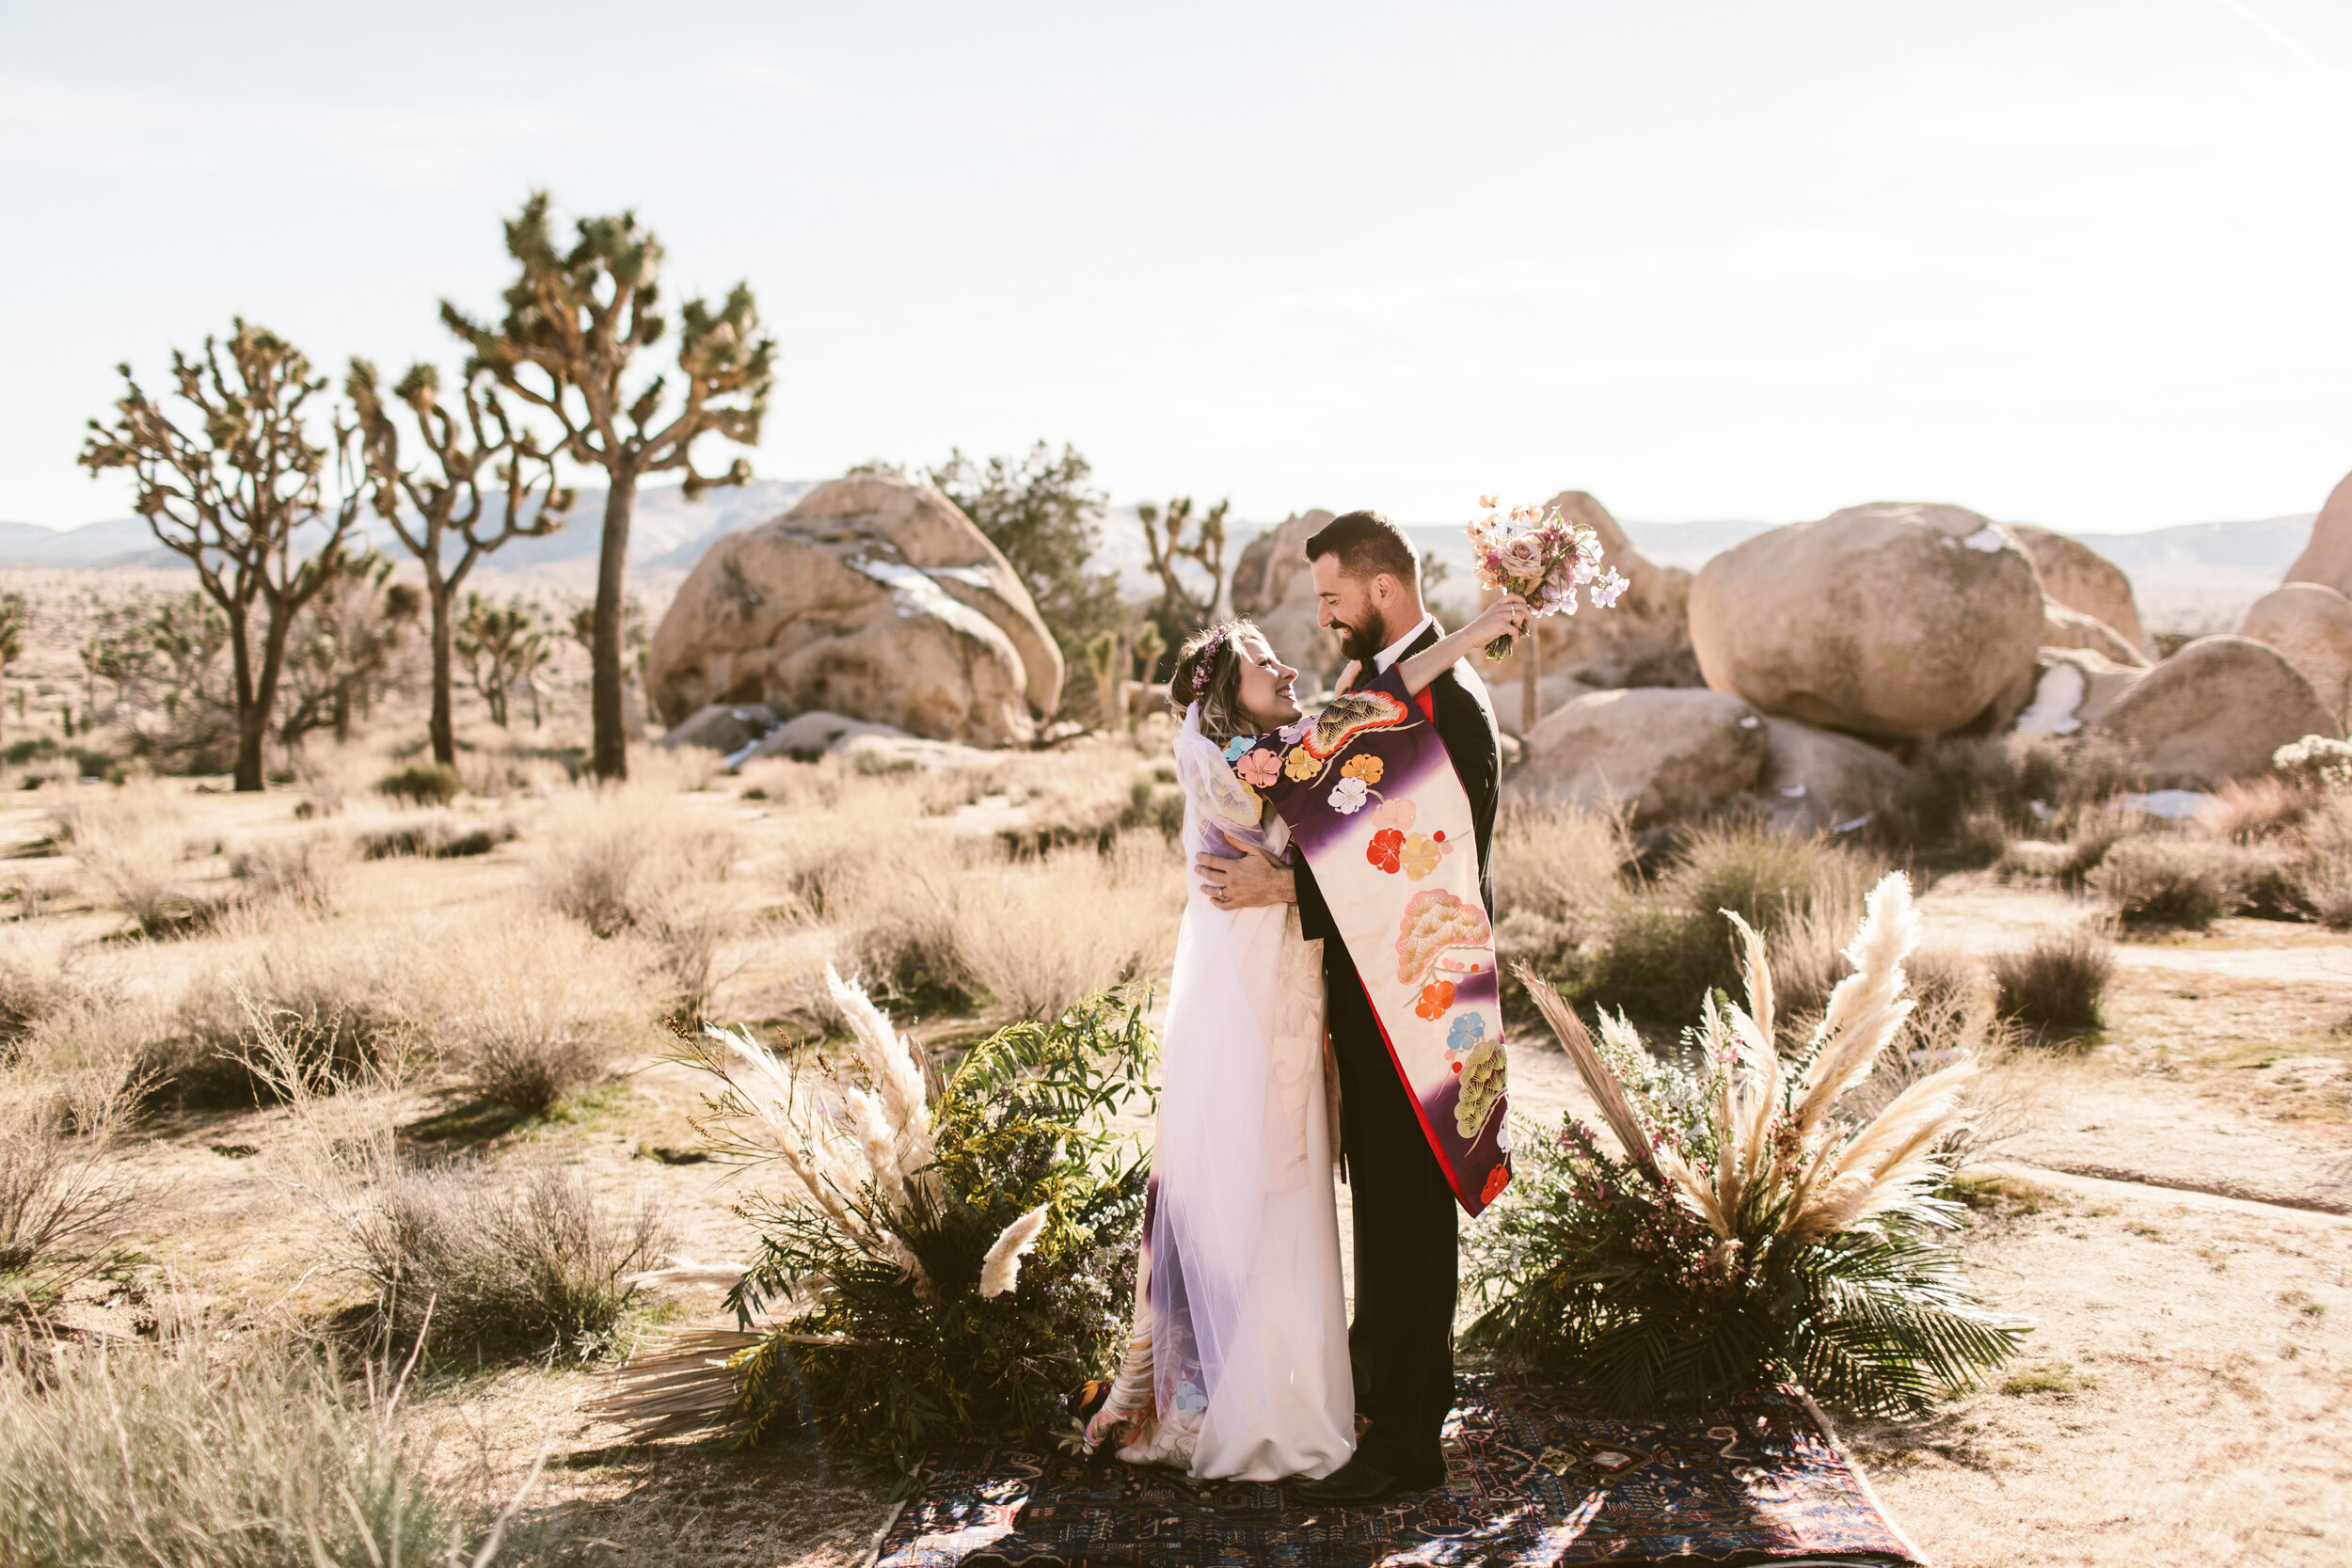 Botanicamuse by Madeleine Shelton Rimrock Ranch Joshua Tree Palm Springs Destination Wedding Snow Westlund Photography